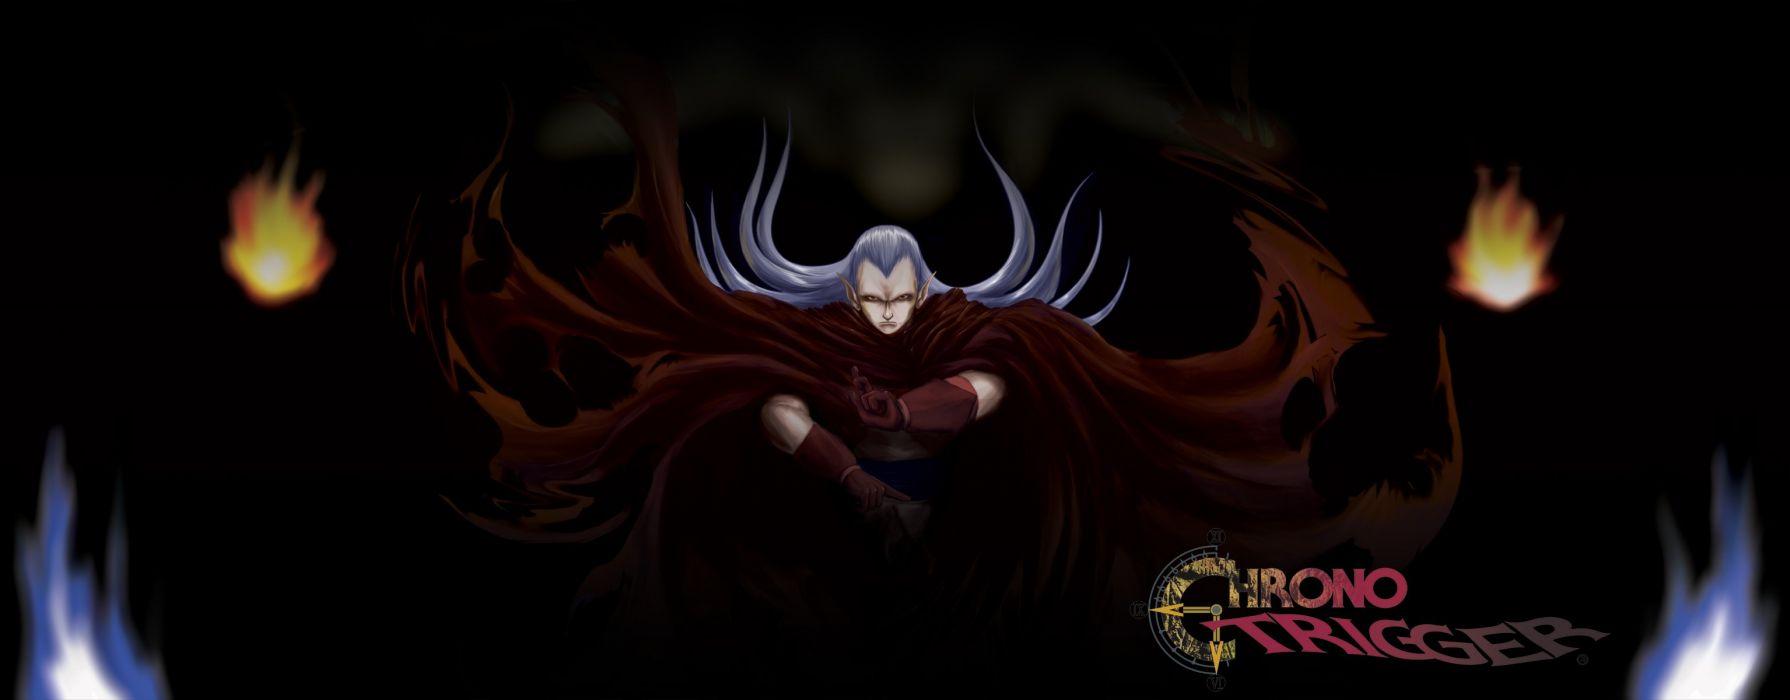 CHRONO TRIGGER rpg anime action fantasy wallpaper